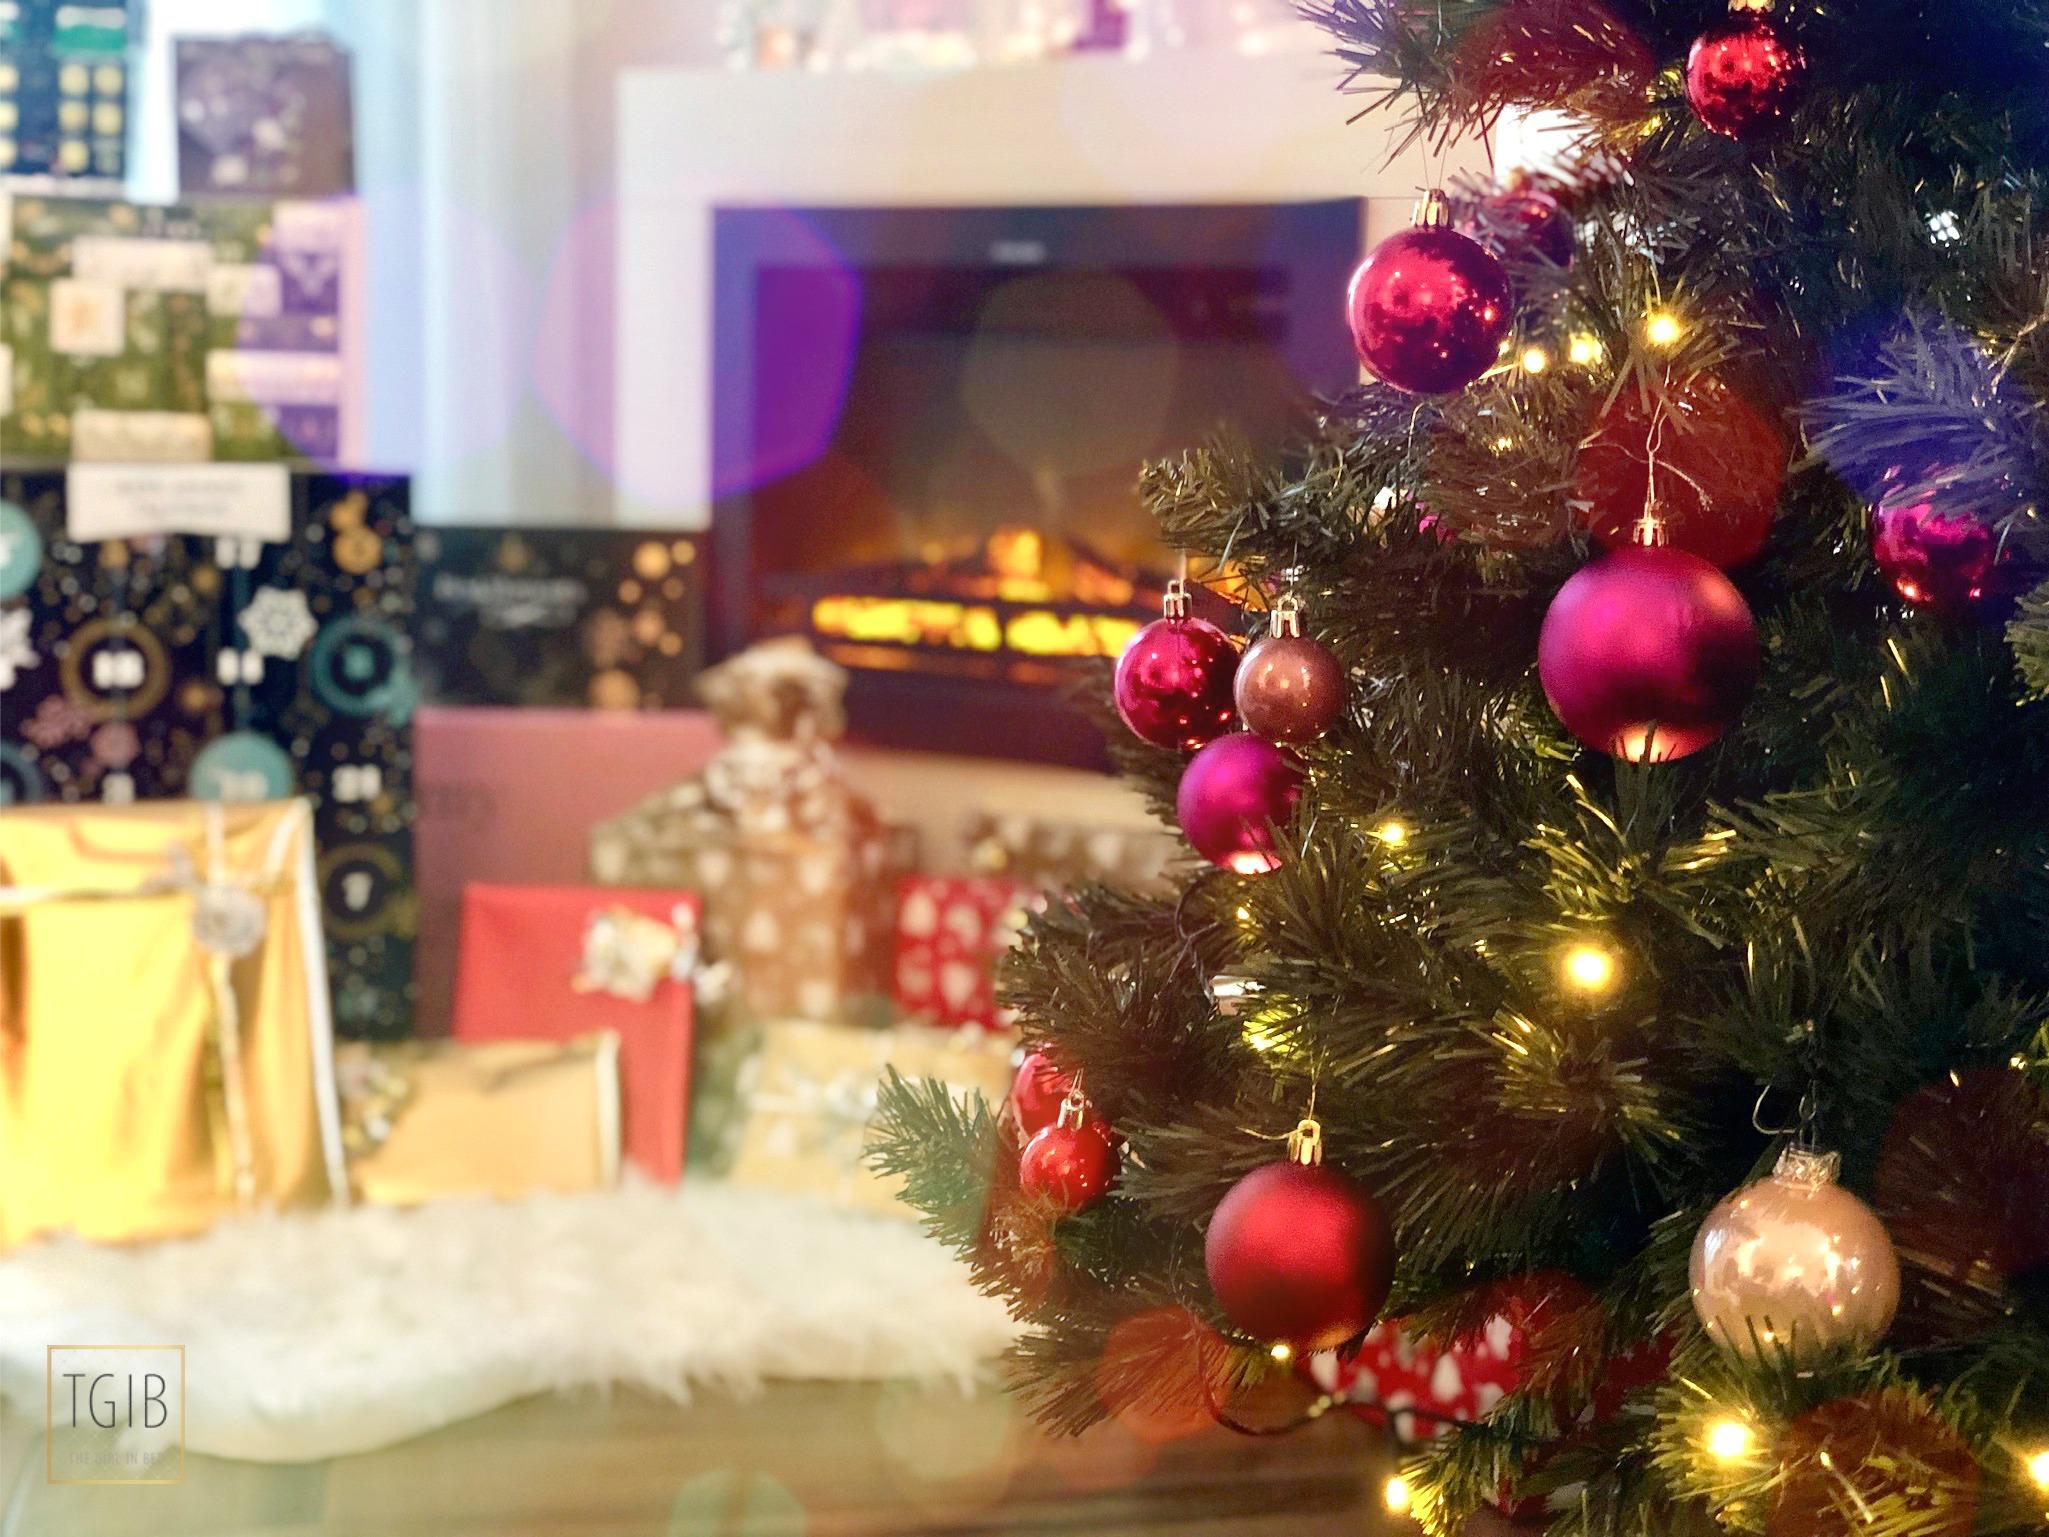 kerstboom met open haard, Christmas tree at a fireplace